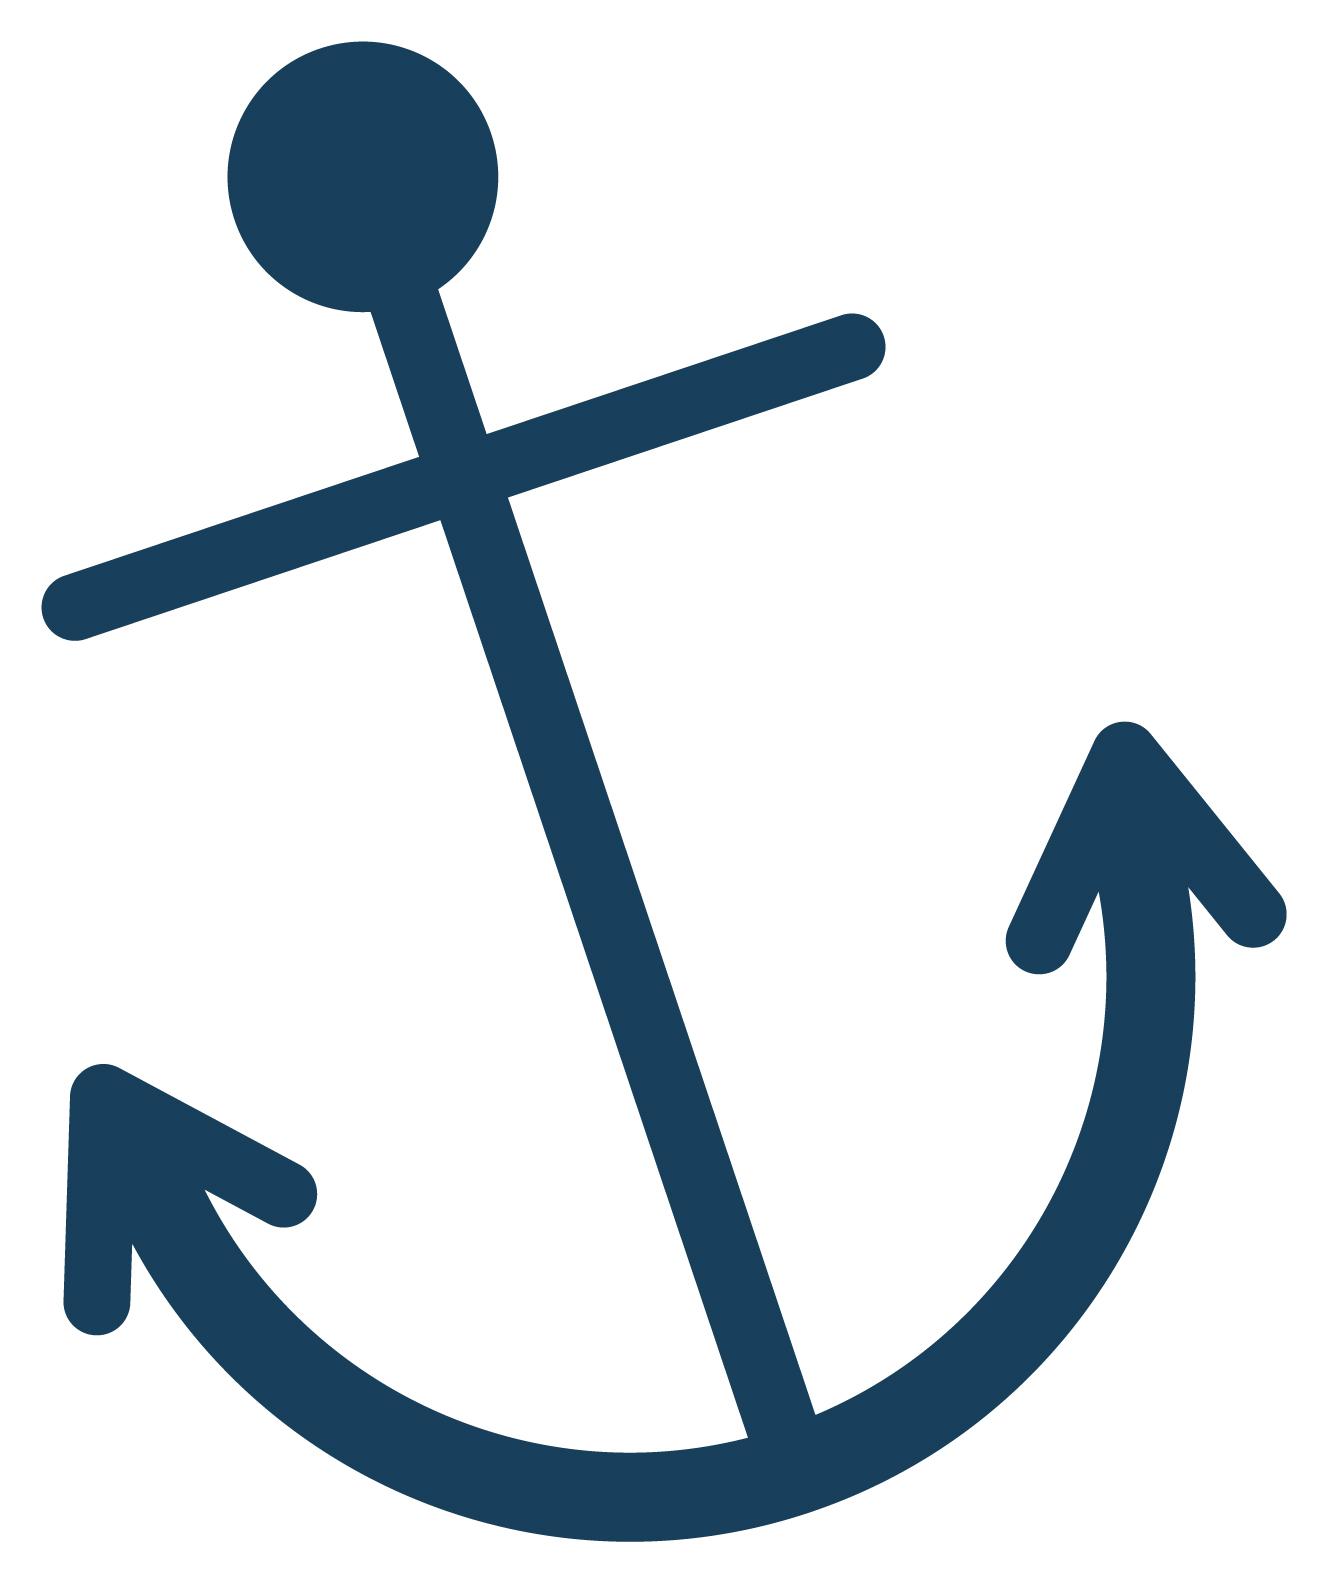 1328x1583 Cute Anchor Clip Art Free Clipart Images 2